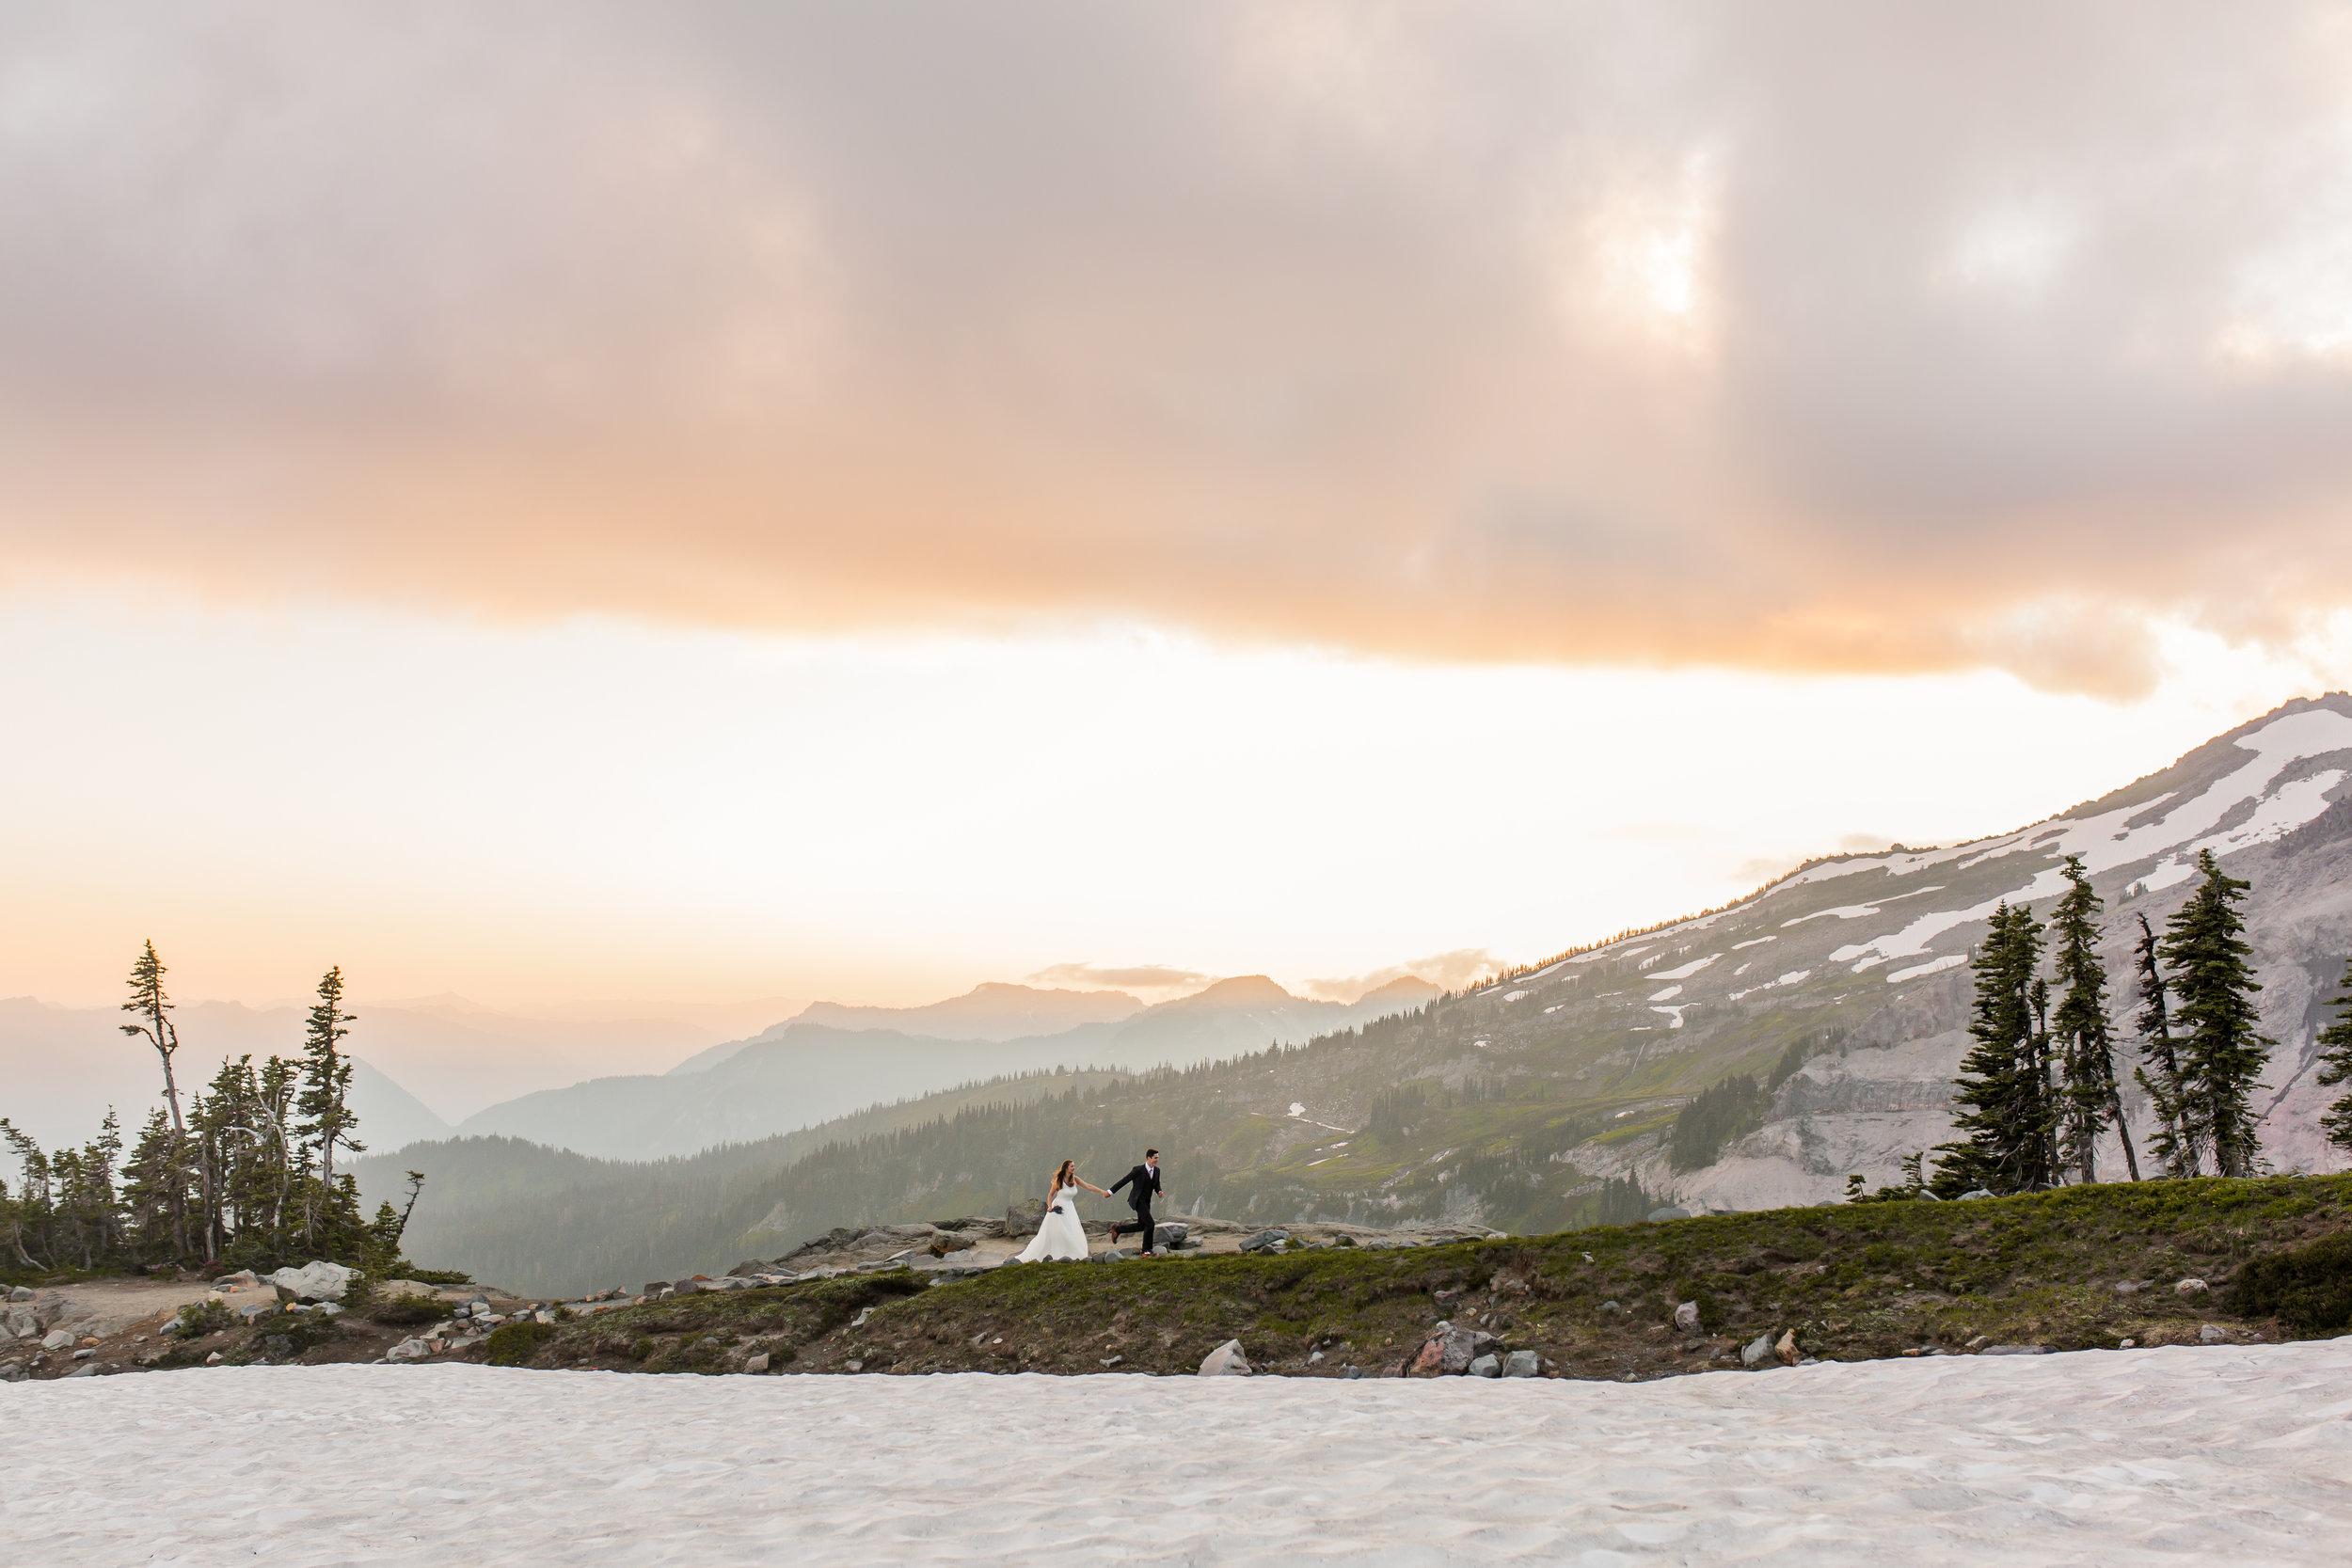 Nicole-Daacke-Photography-Mt-Rainier-elopement-photographer-washington-mountain-epic-wedding-photography-wildflowers-at-rainier-pine-tree-cloudy-summer-day-at-mountain-rainier-50.jpg